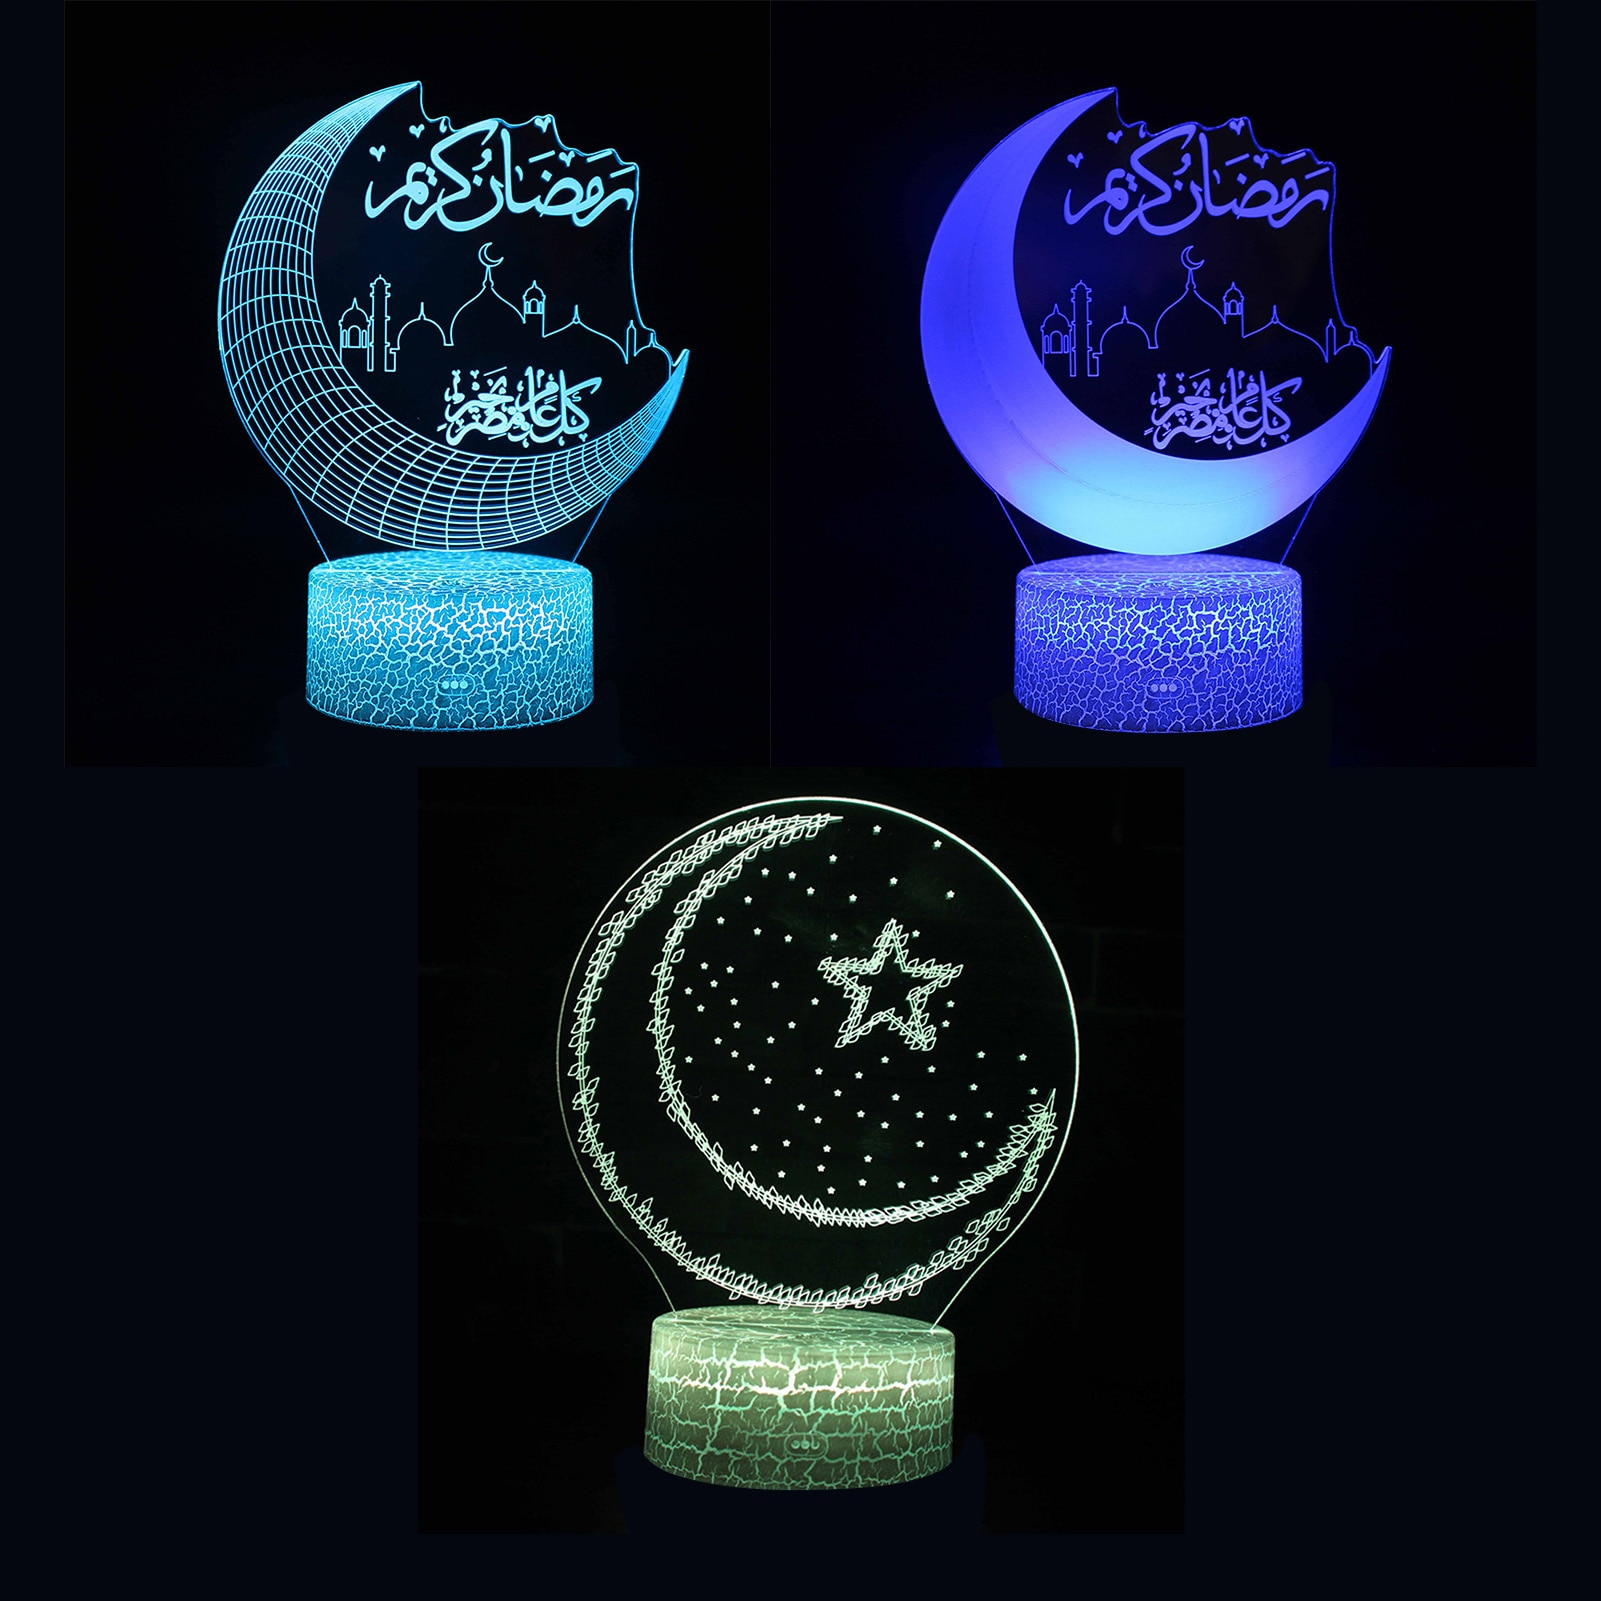 Ramadan Decorative Household Desktop Lights LED Lights Remote Control Colorful Lights Islamic Eid Al Fitr Mubarak Ramadan Gifts